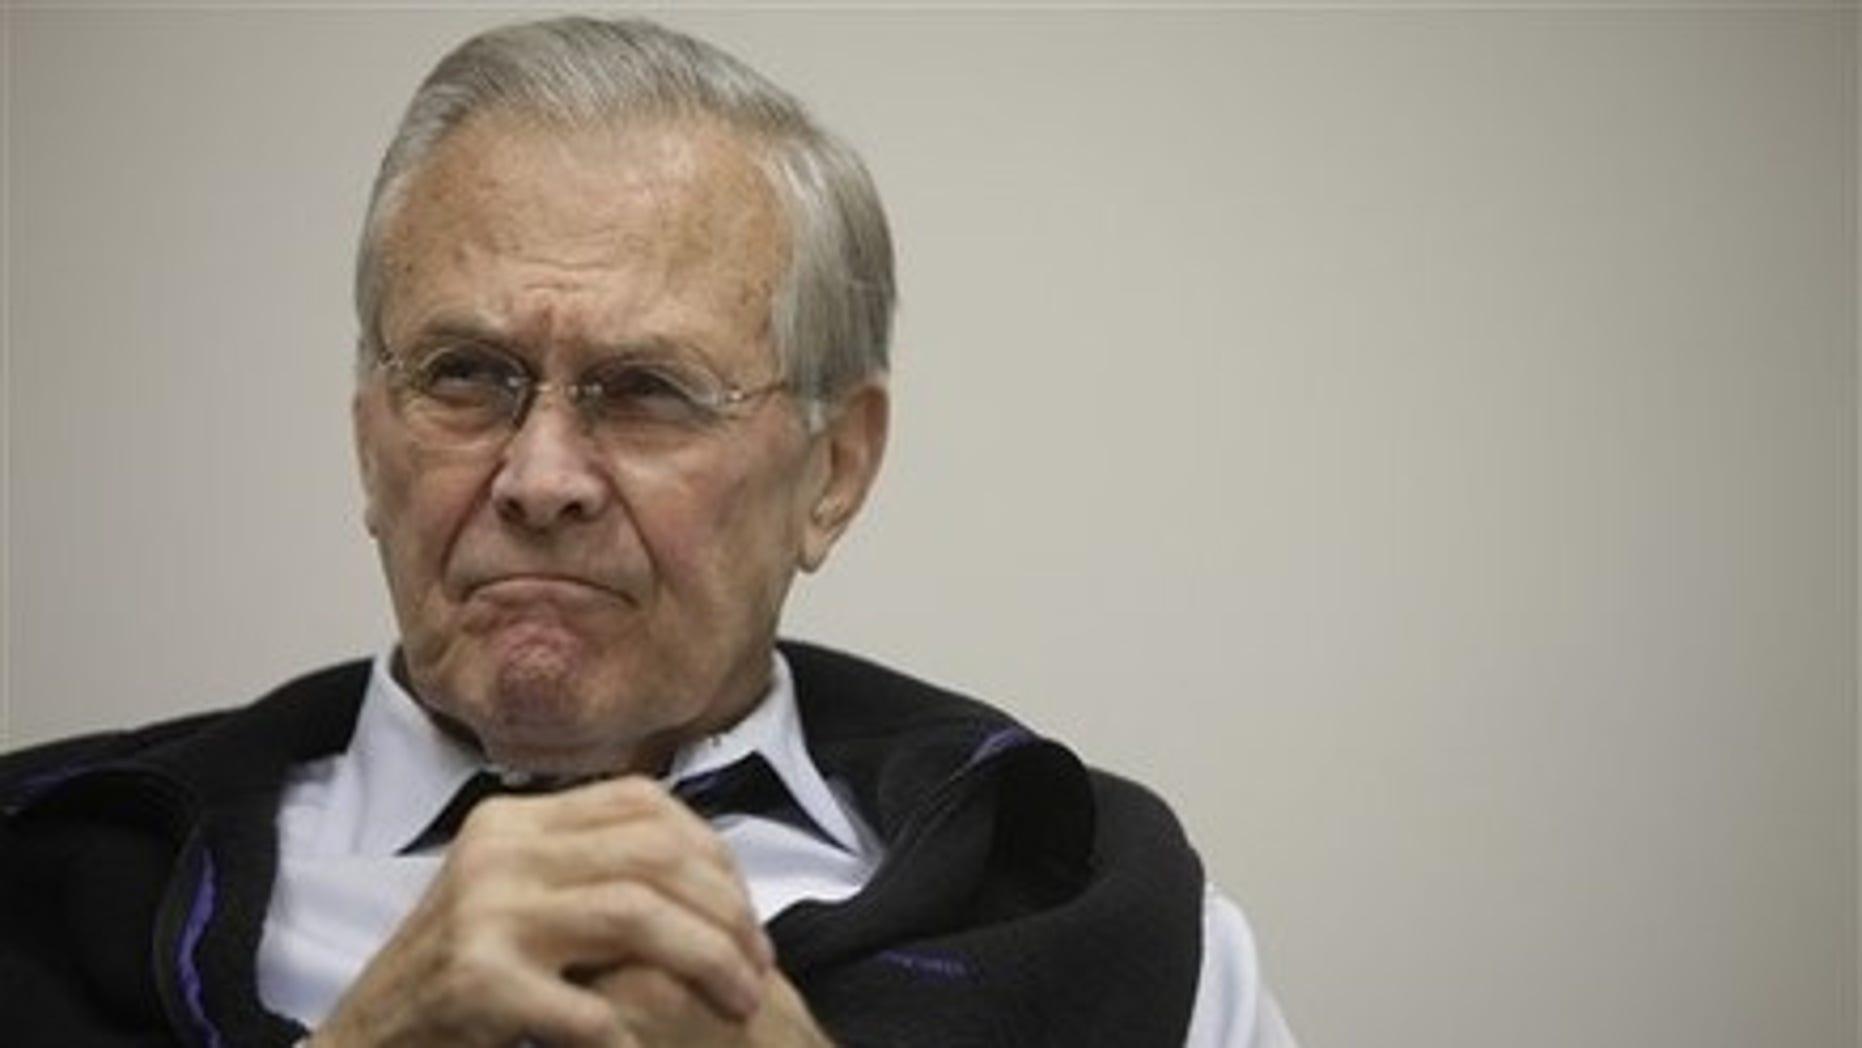 Thursday: Former Defense Secretary Donald H. Rumsfeld is interviewed at his office in Washington.